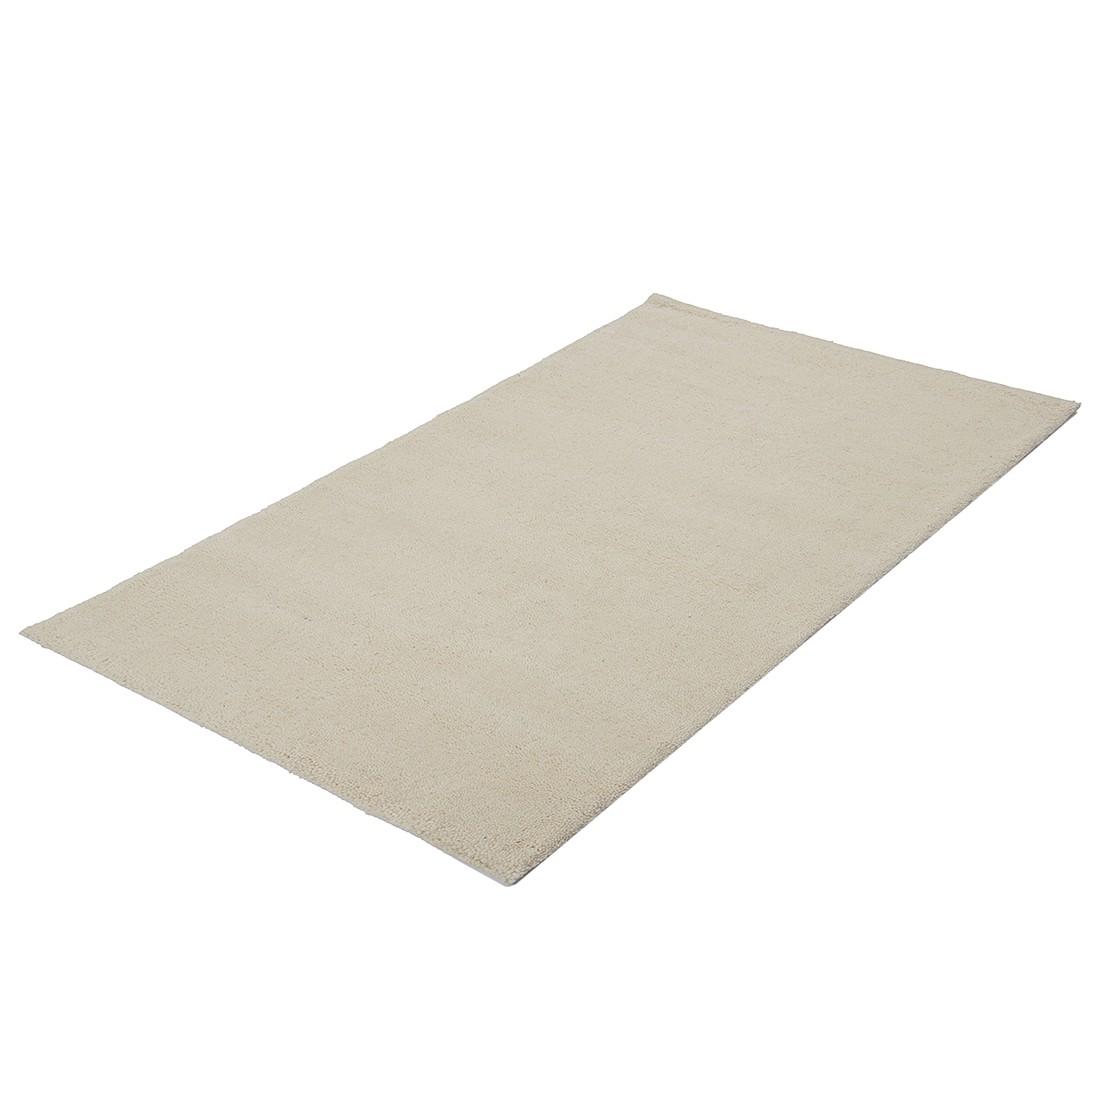 Teppich Berber Simple - Creme - Maße: 240 x 170 cm, Parwis